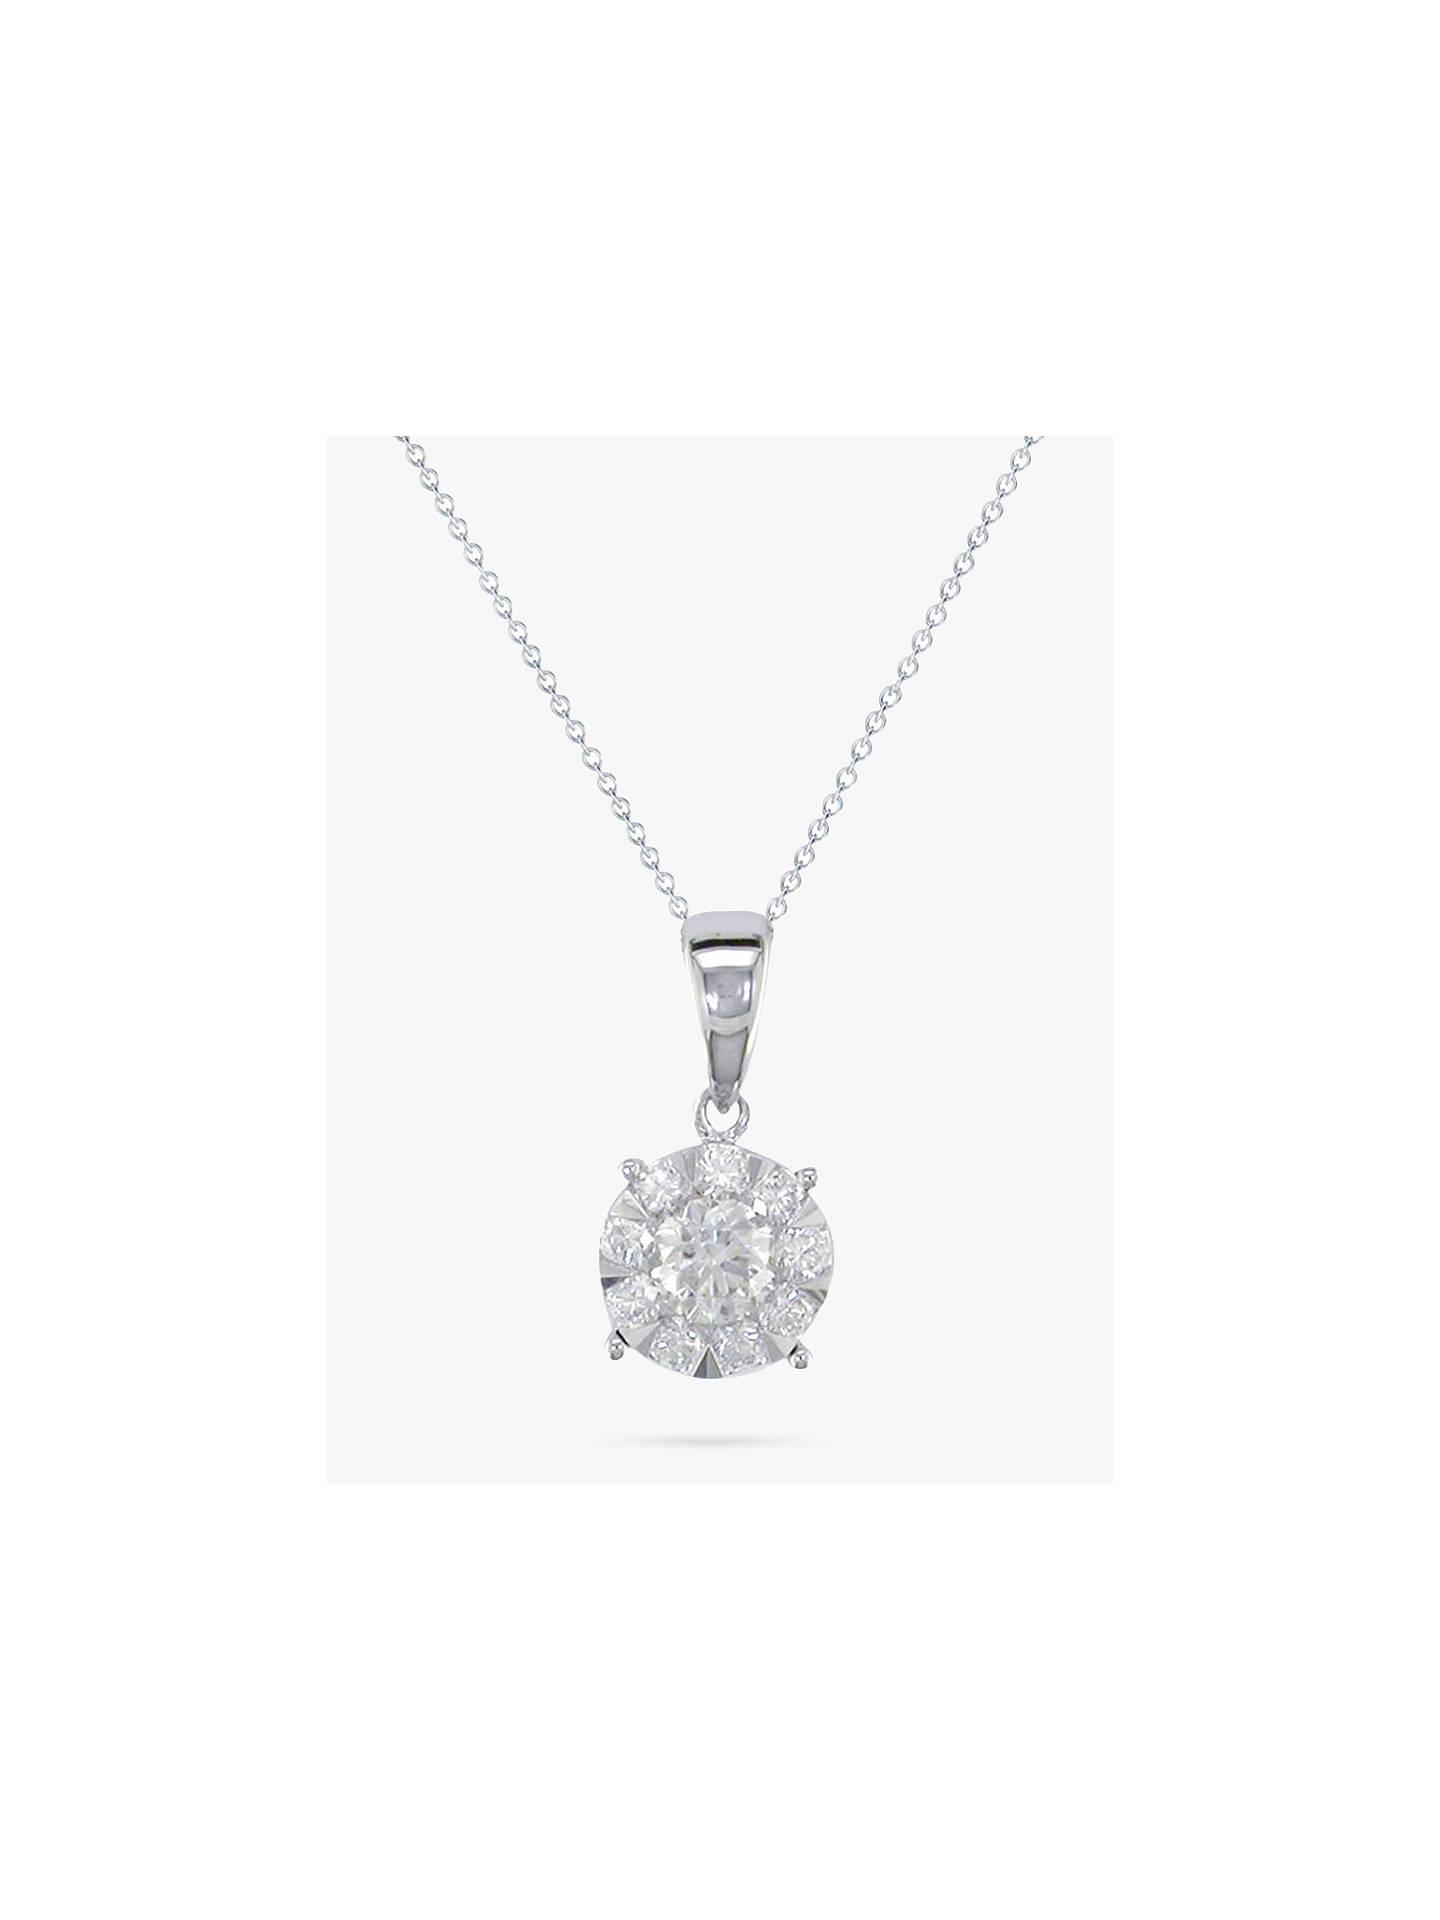 a251e8b499ad83 Buy E.W Adams 18ct White Gold Diamond Illusion Pendant Necklace, White Gold  Online at johnlewis ...